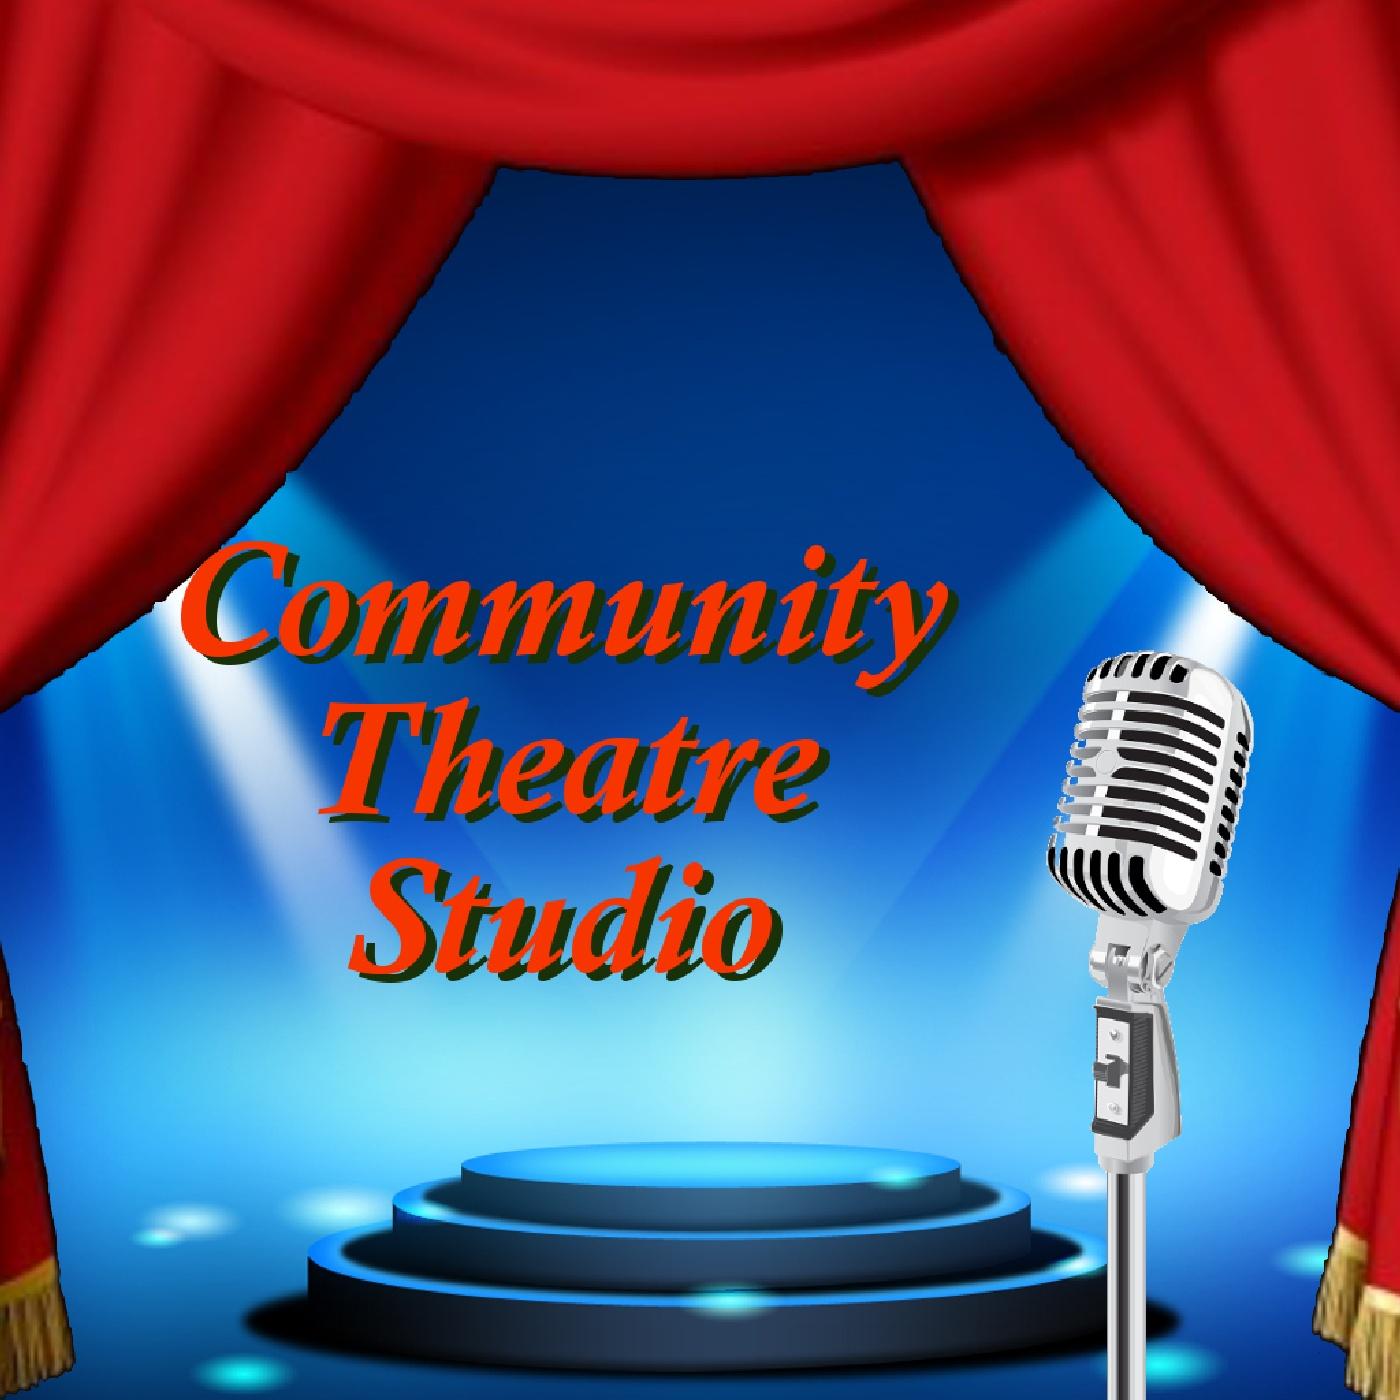 Community Theatre Studio